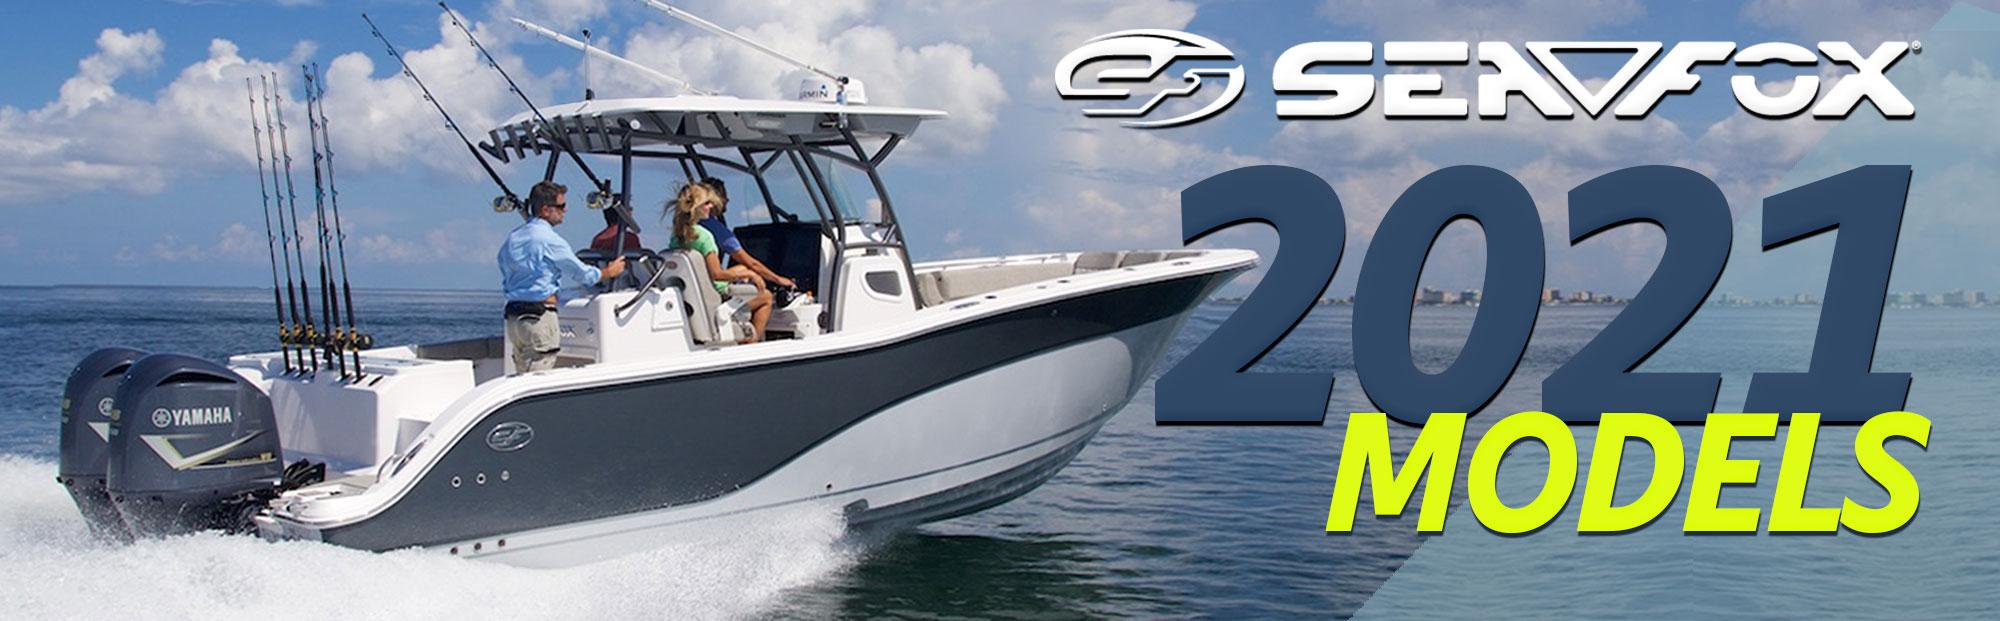 seafox-banner-coming-2021-models.jpg